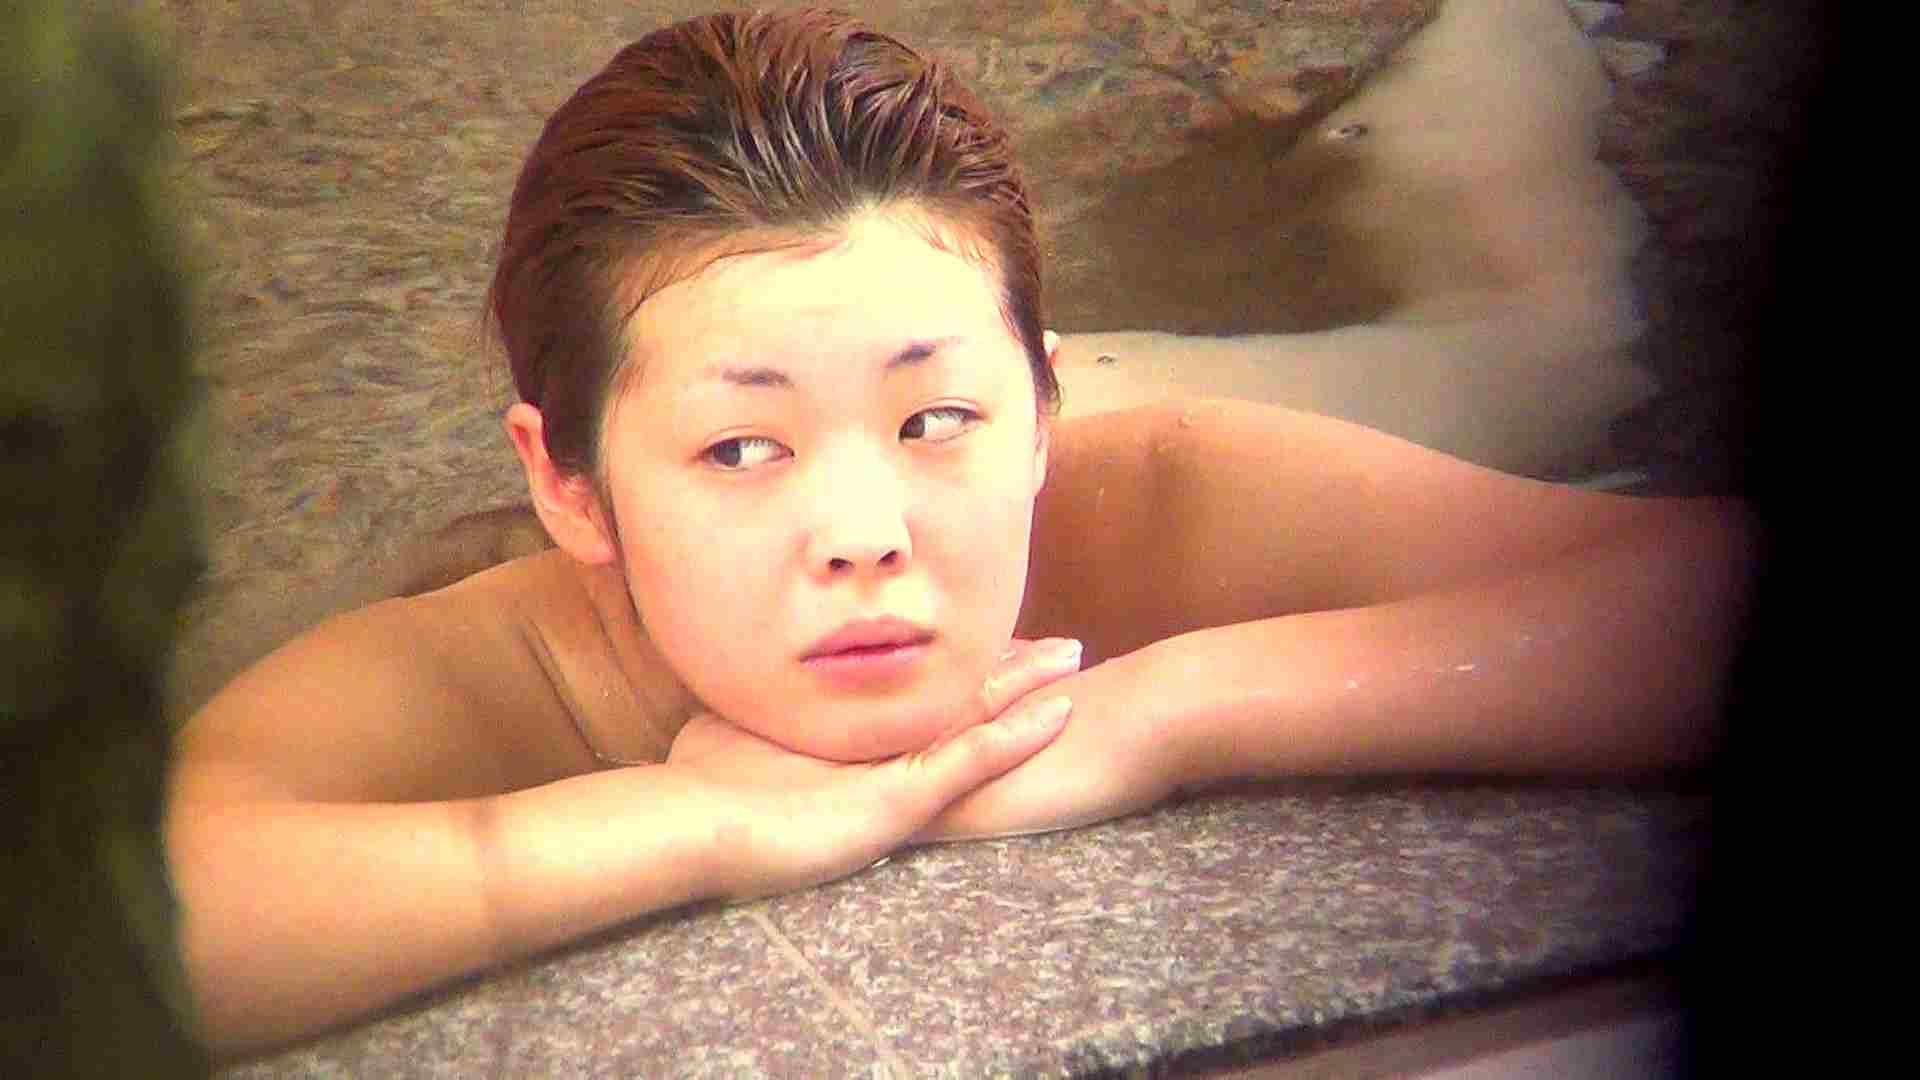 Aquaな露天風呂Vol.288 盗撮シリーズ | 露天風呂編  79PIX 55